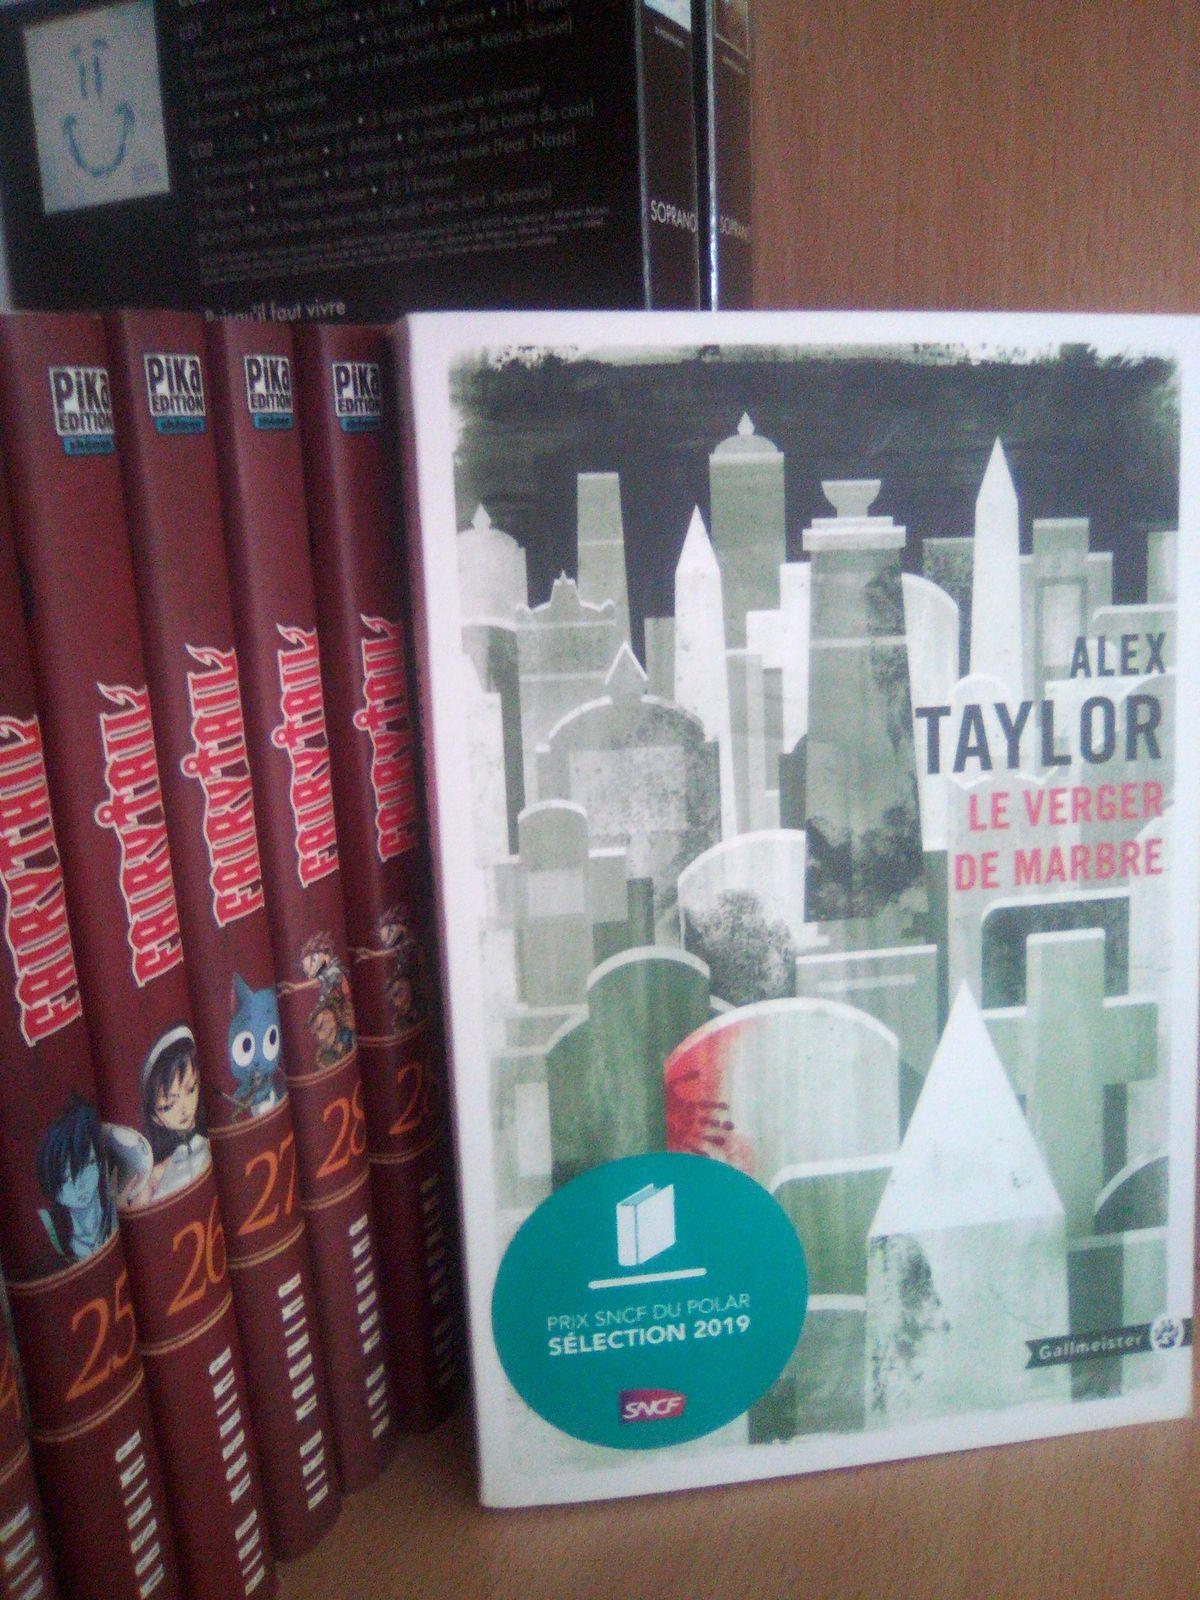 AvisRomanNoir : le verger de marbre de Alex TAYLOR (Ed. Gallmeister)